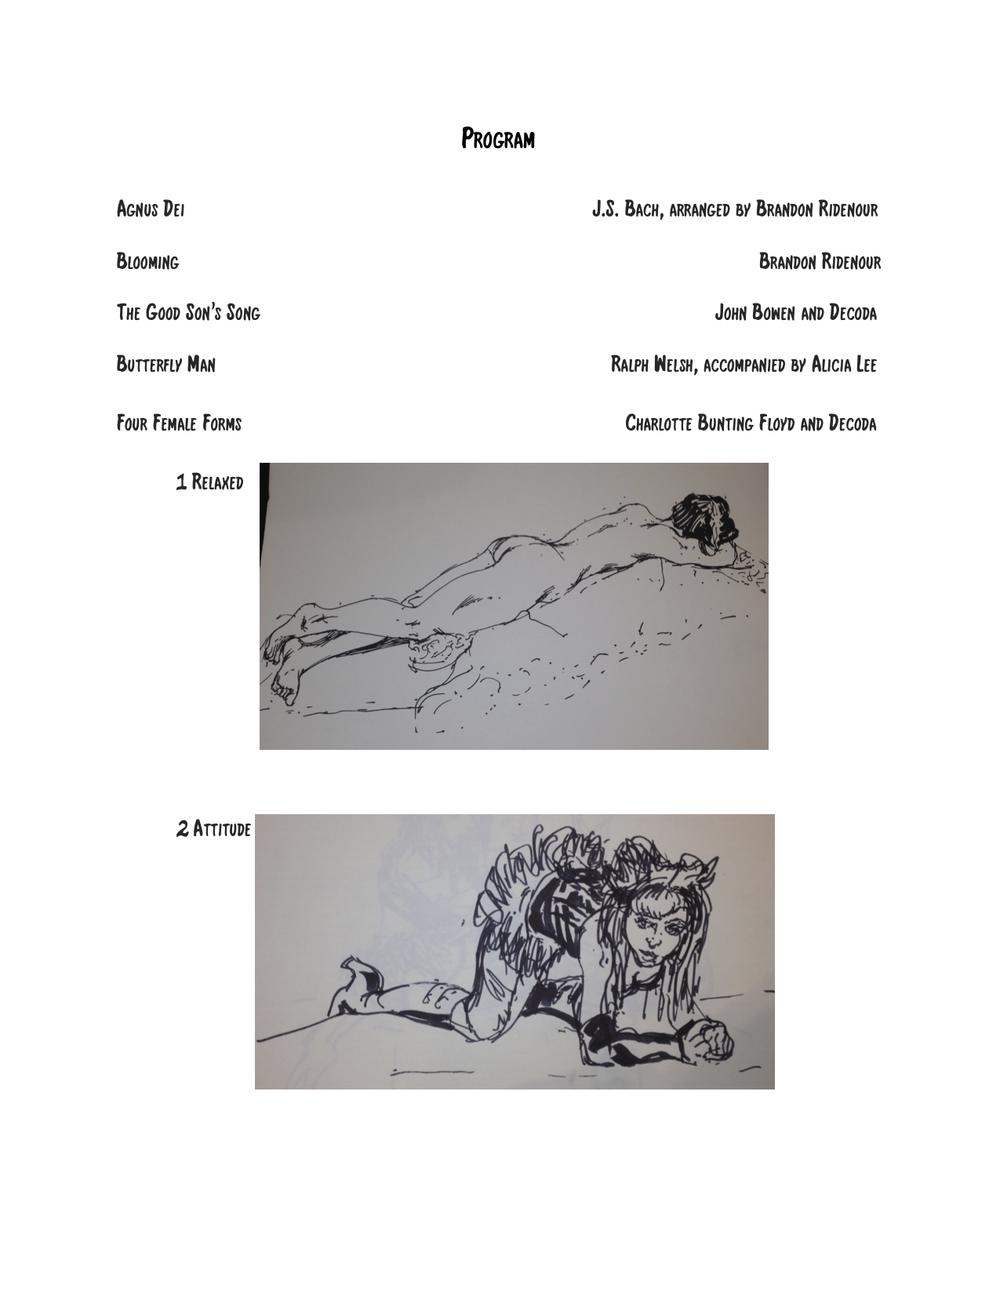 Concert Program, page 2